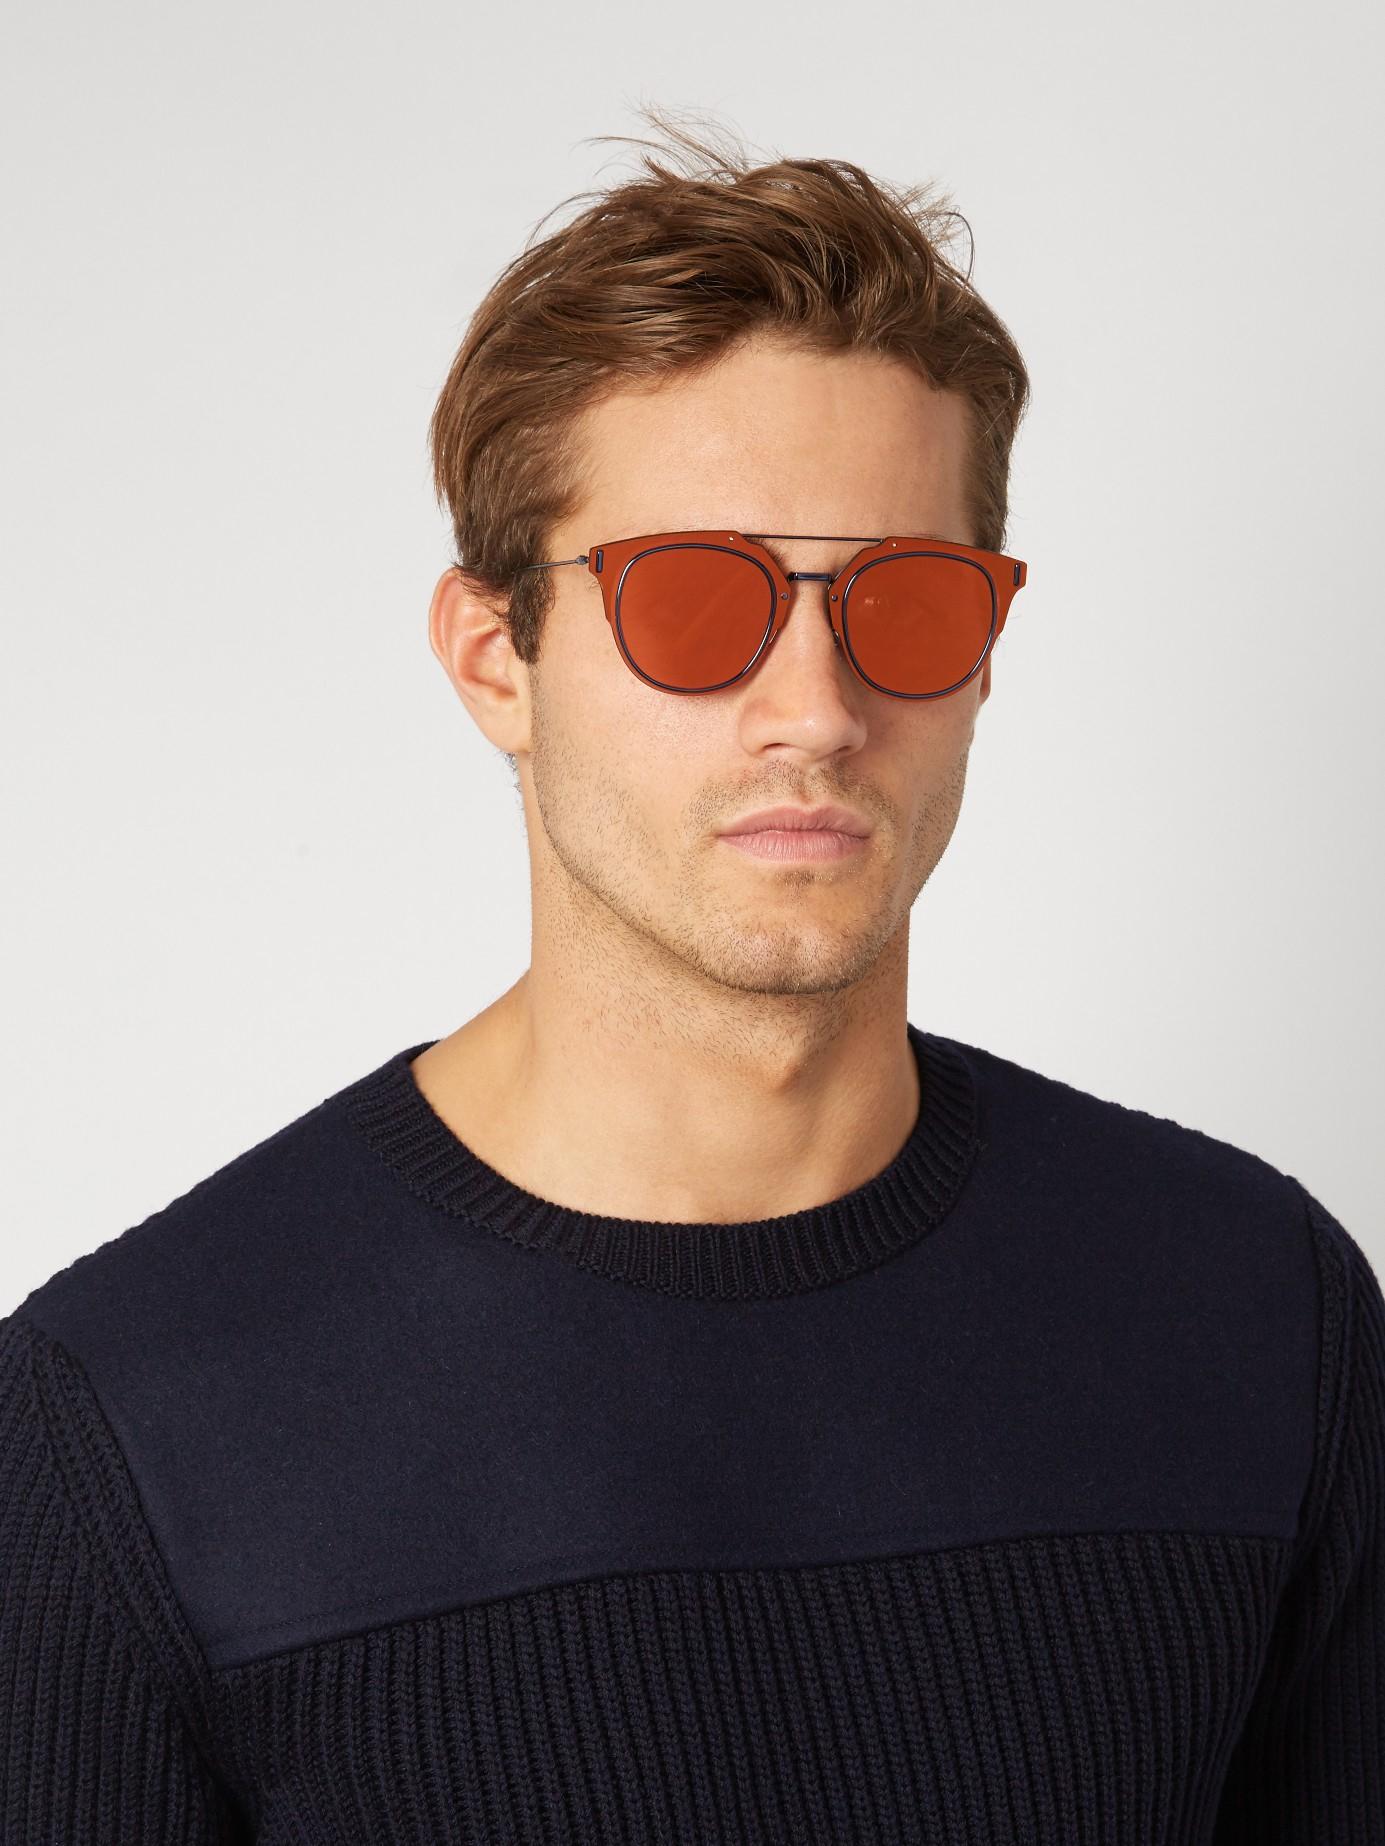 99572a5fe7a Lyst - Dior Homme Composit 1.0 Pantos-style Sunglasses for Men